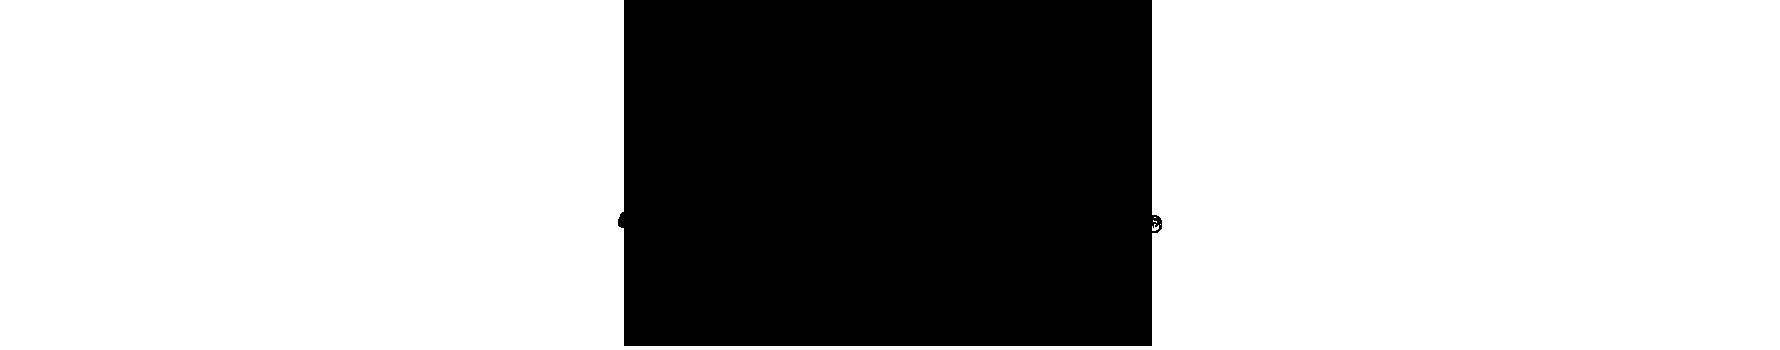 club 美ノ間【ビノマ】(六本木)のロゴ